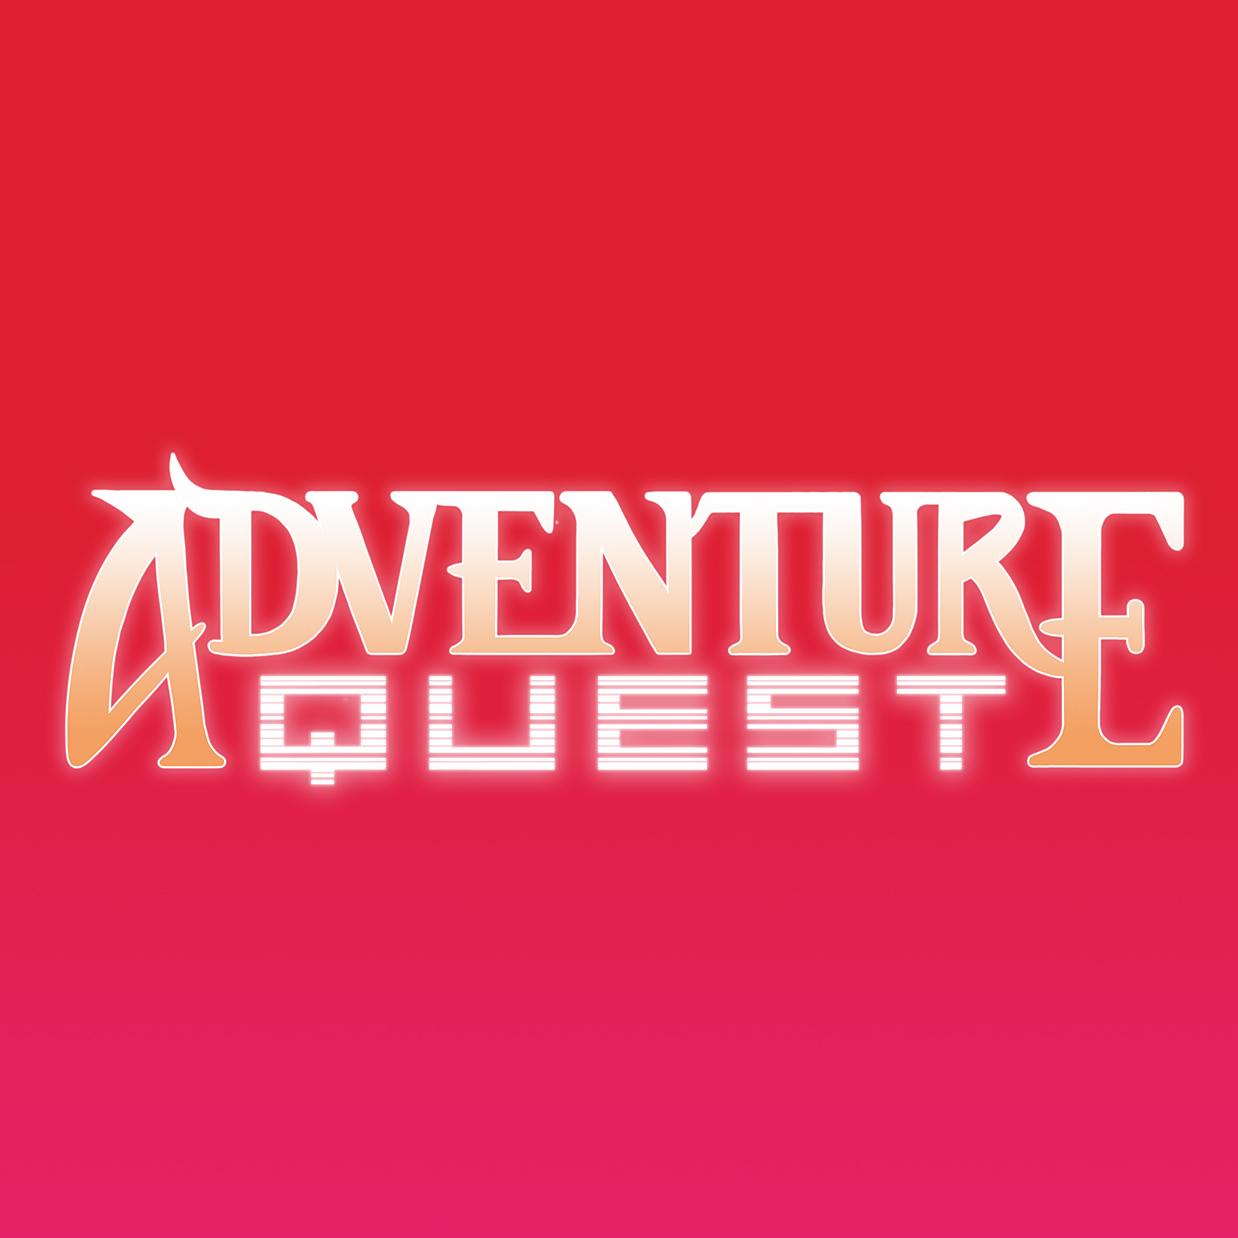 adventurequestlogo_web.jpg